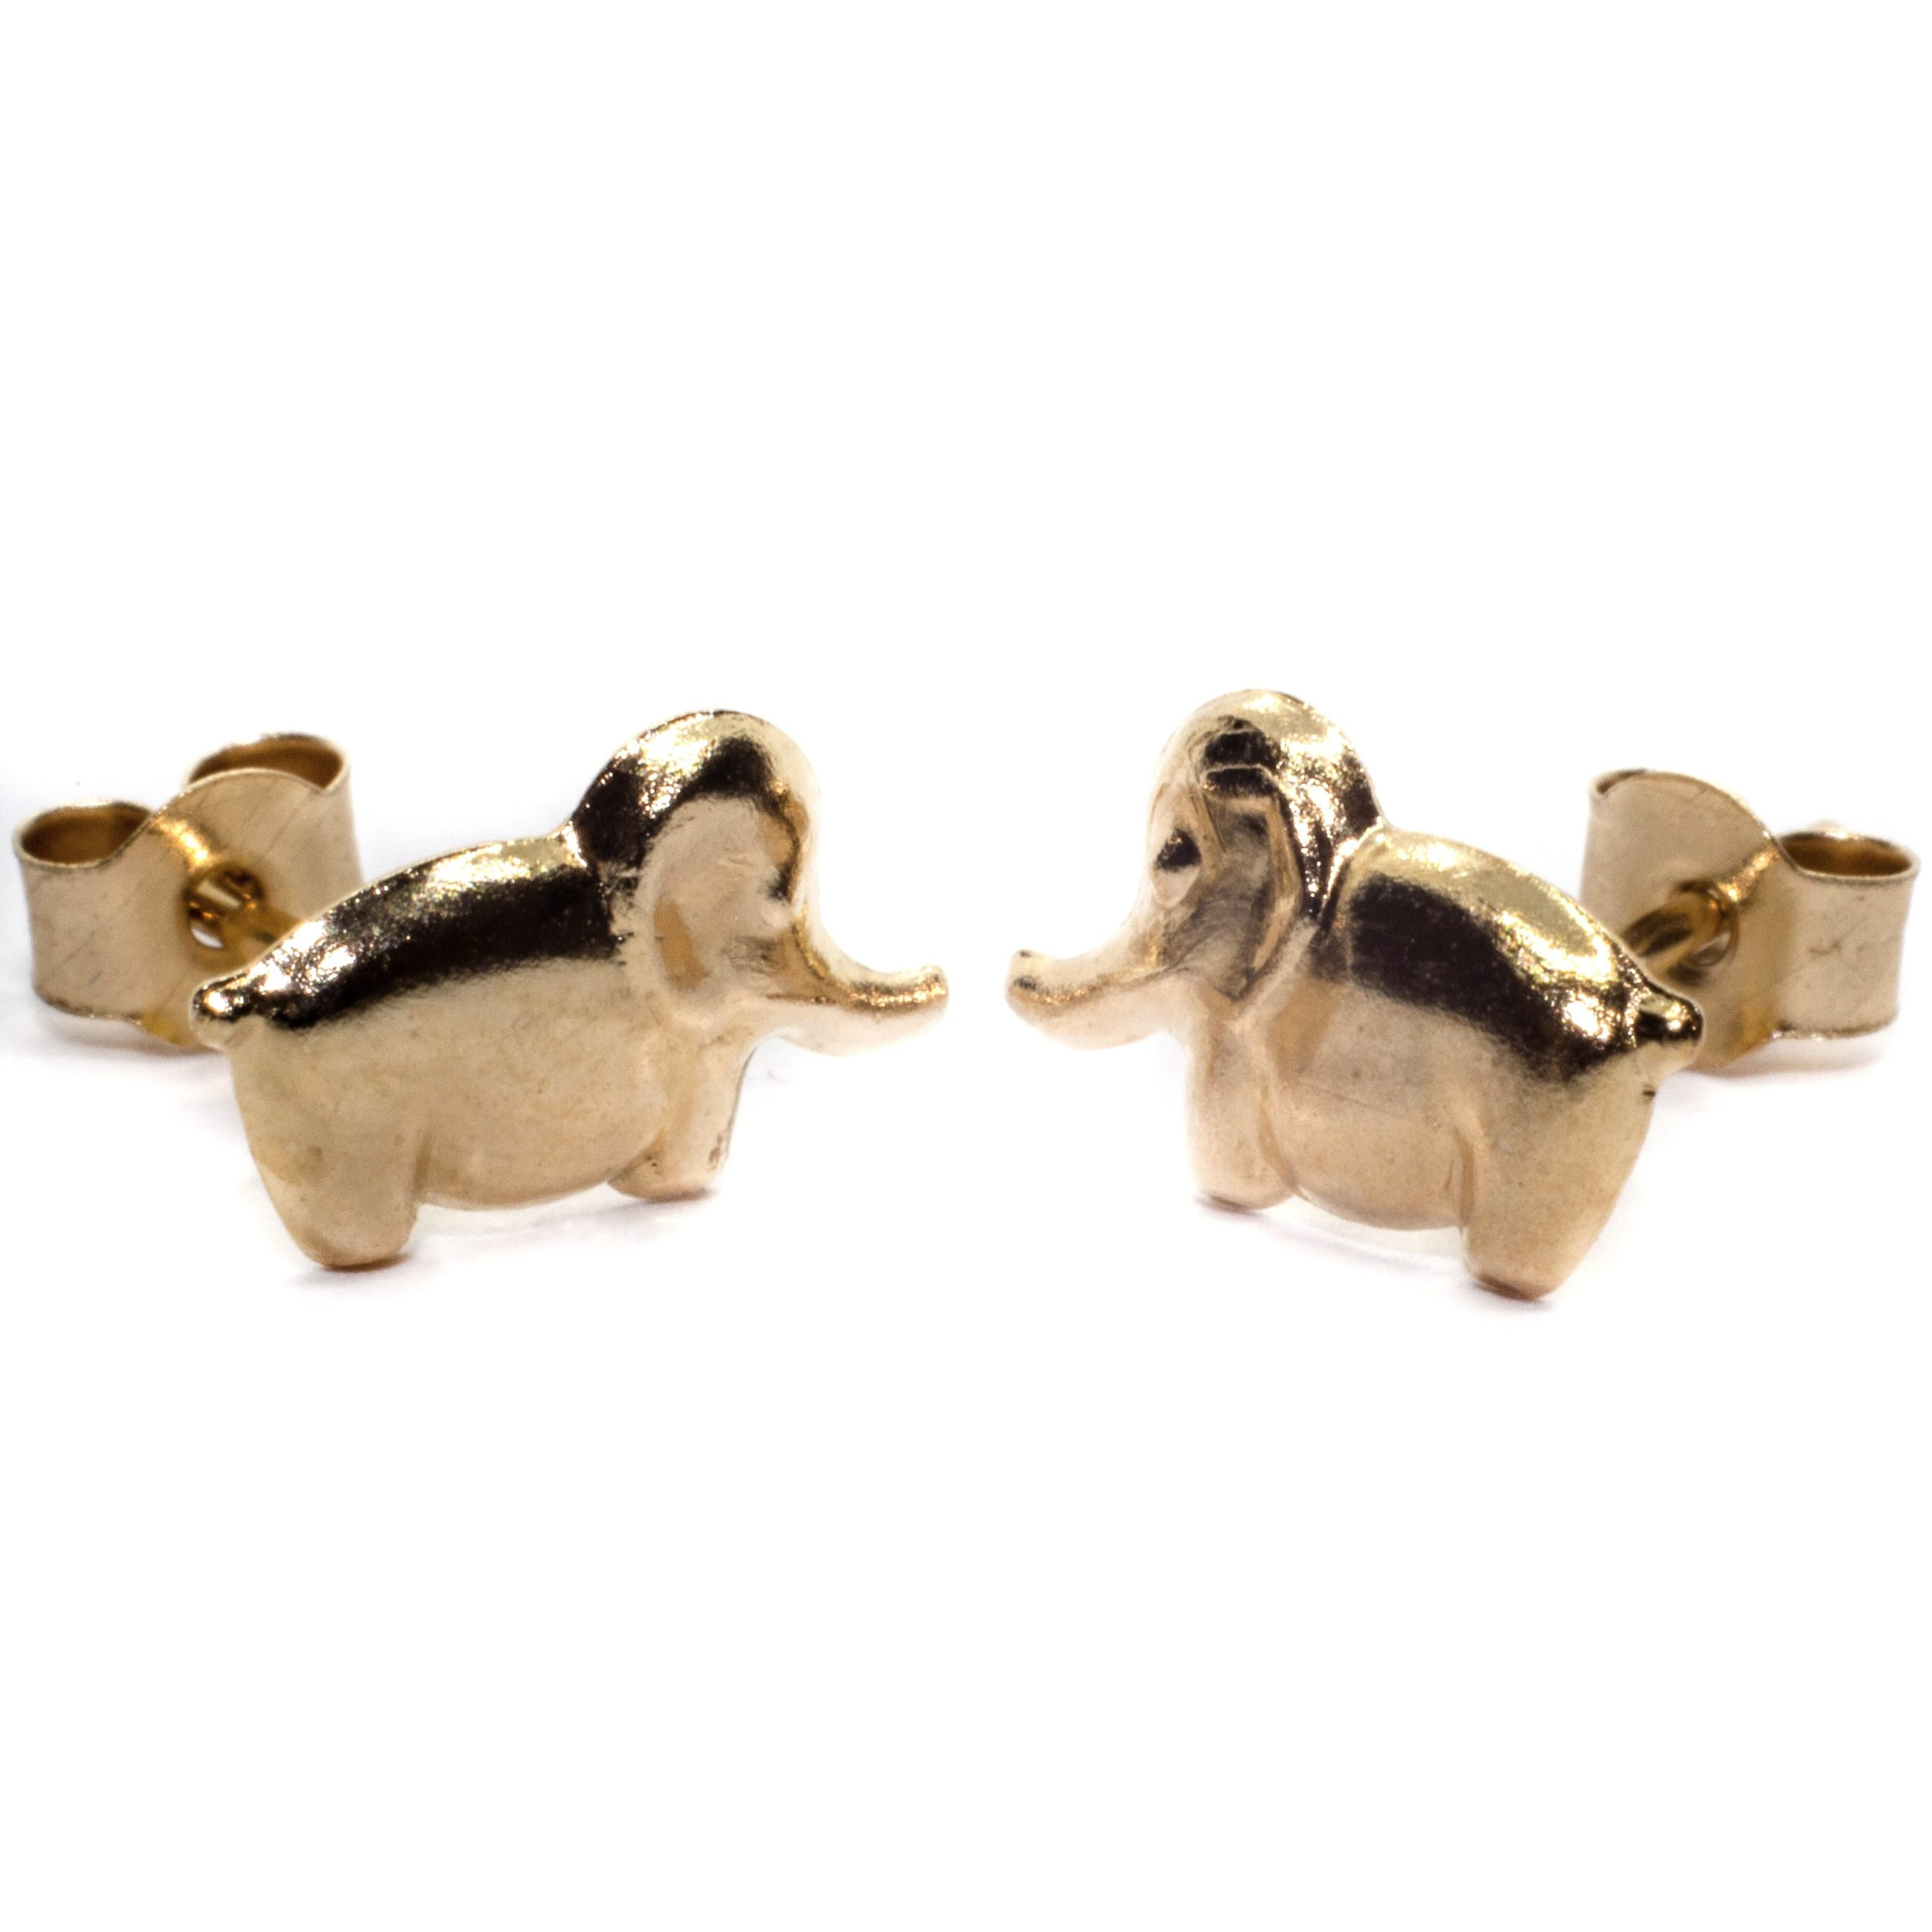 8mm elephant stud earring 9ct yellow gold (alt 3)